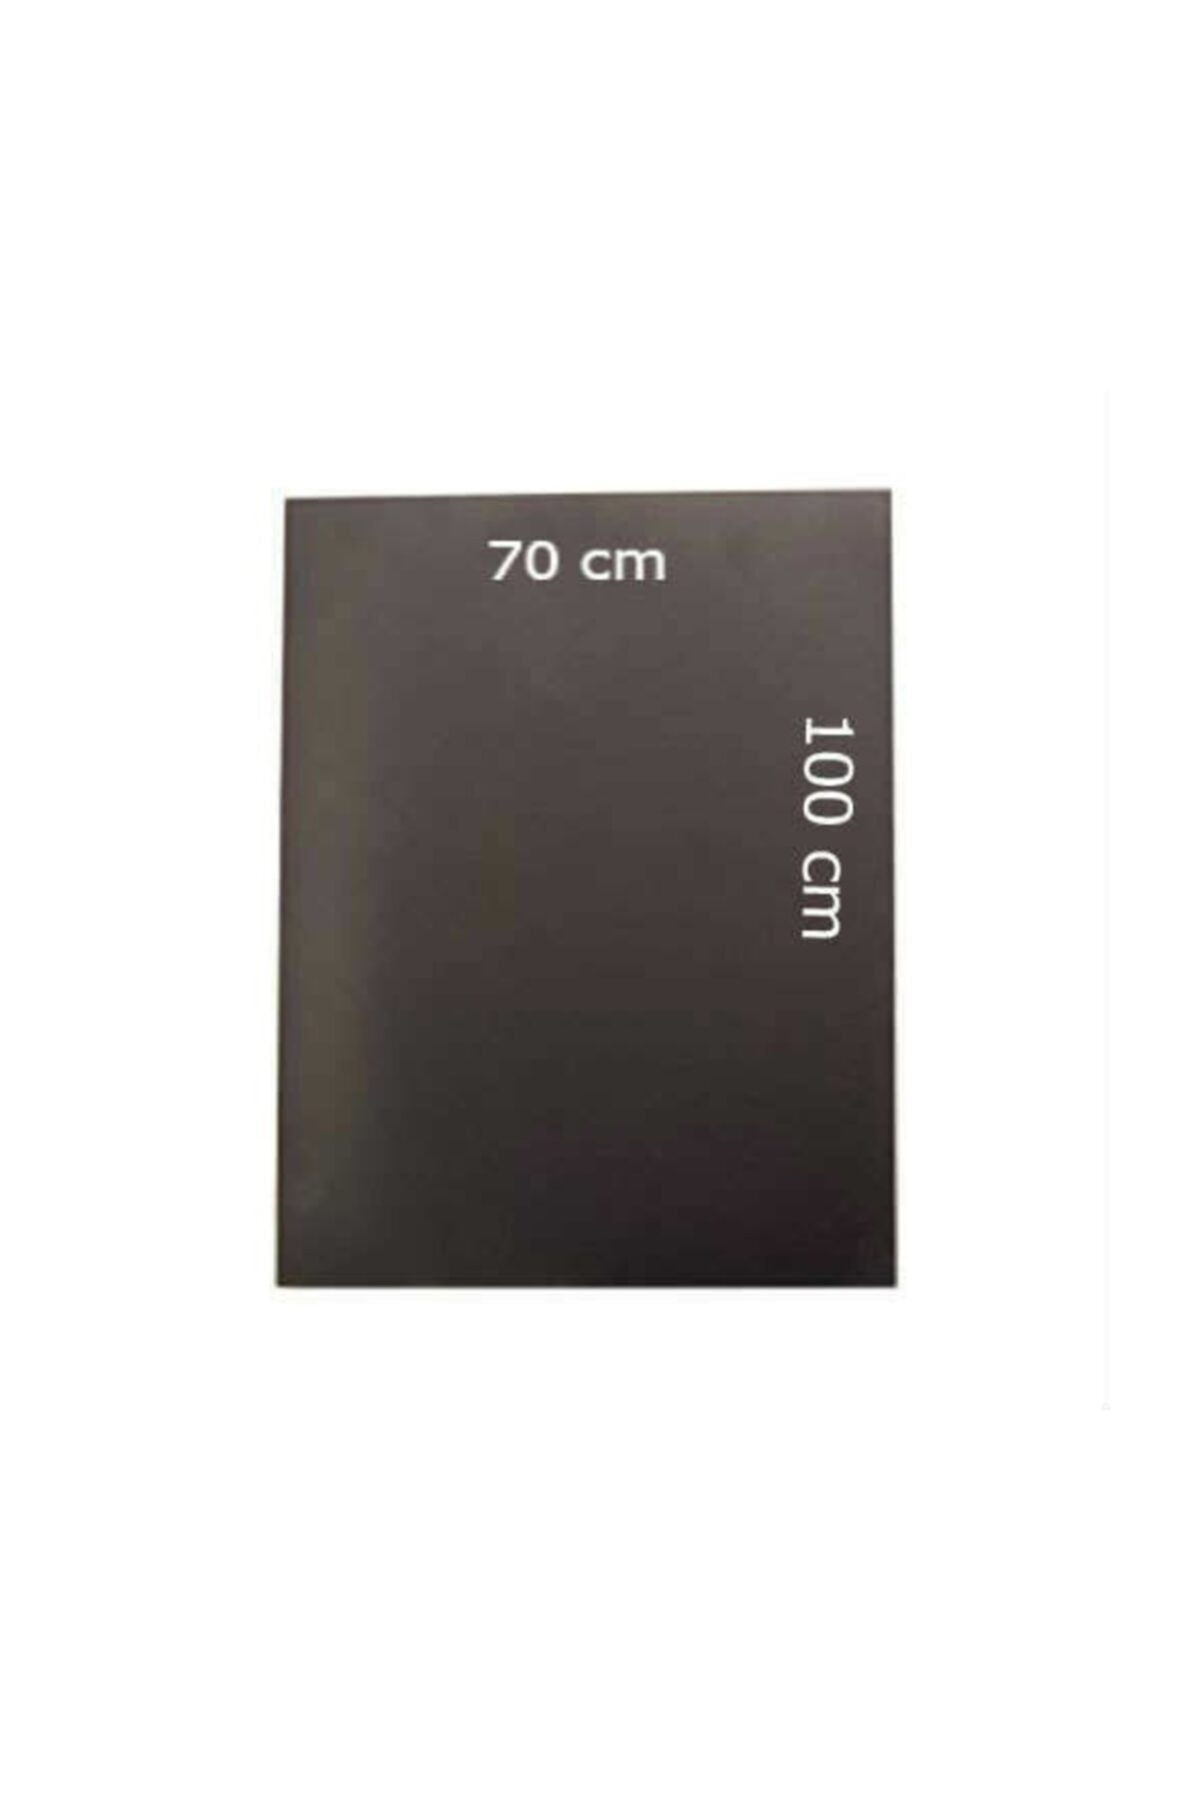 Dünya Magnet Mıknatıs Plaka 70cmx100 Cm - Fotoğraf Magneti, Tabaka Levha Magnet Mıknatıs 2